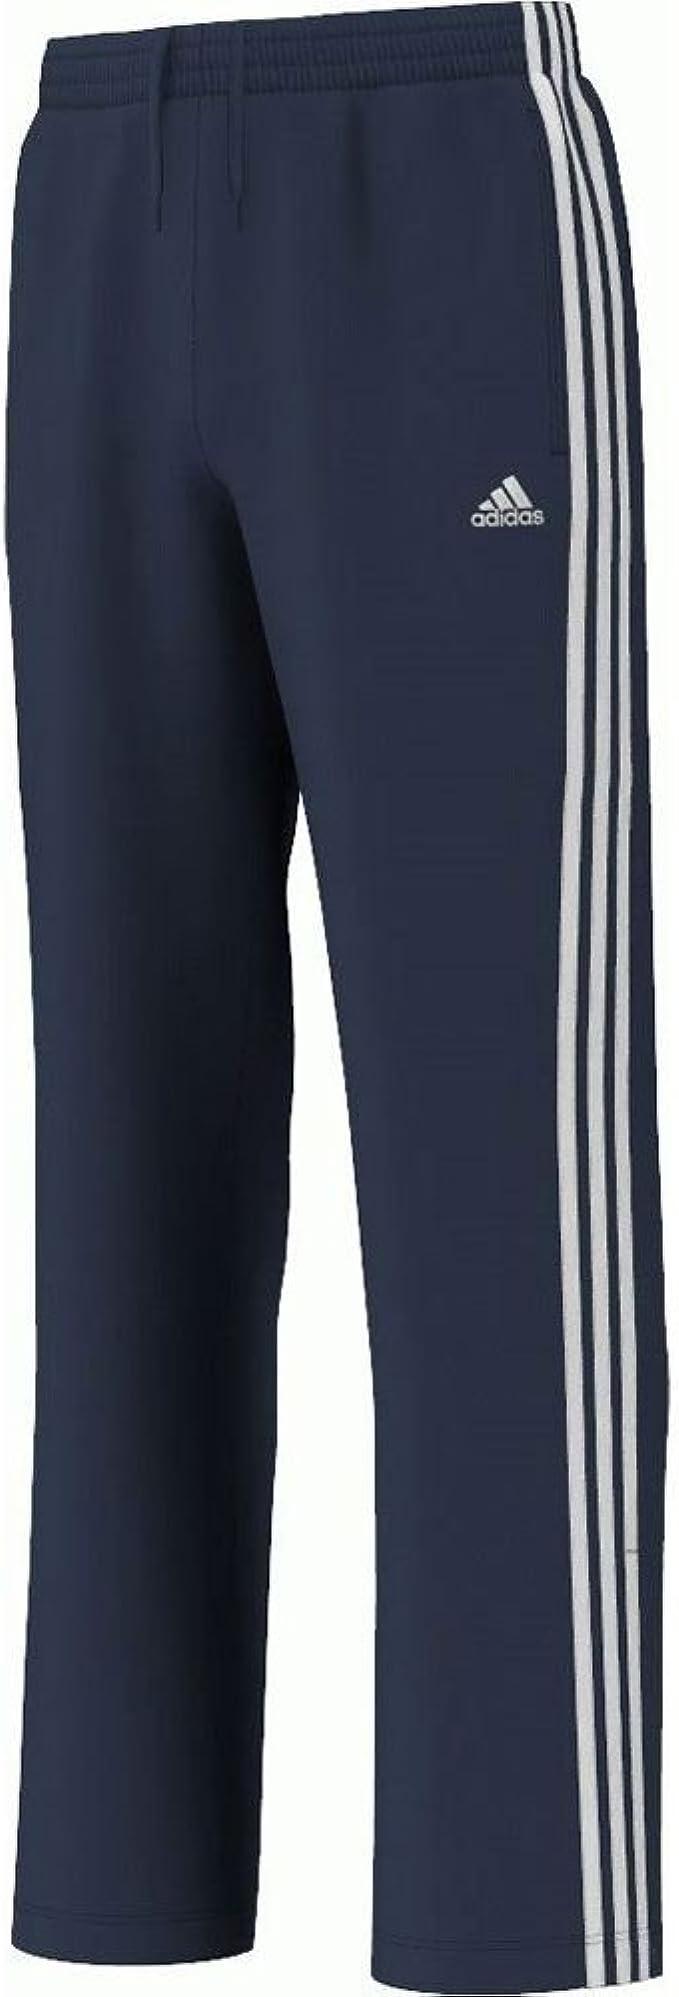 adidas Essentials 3 Rayas Junior Chándal Pantalones Azul Azul ...